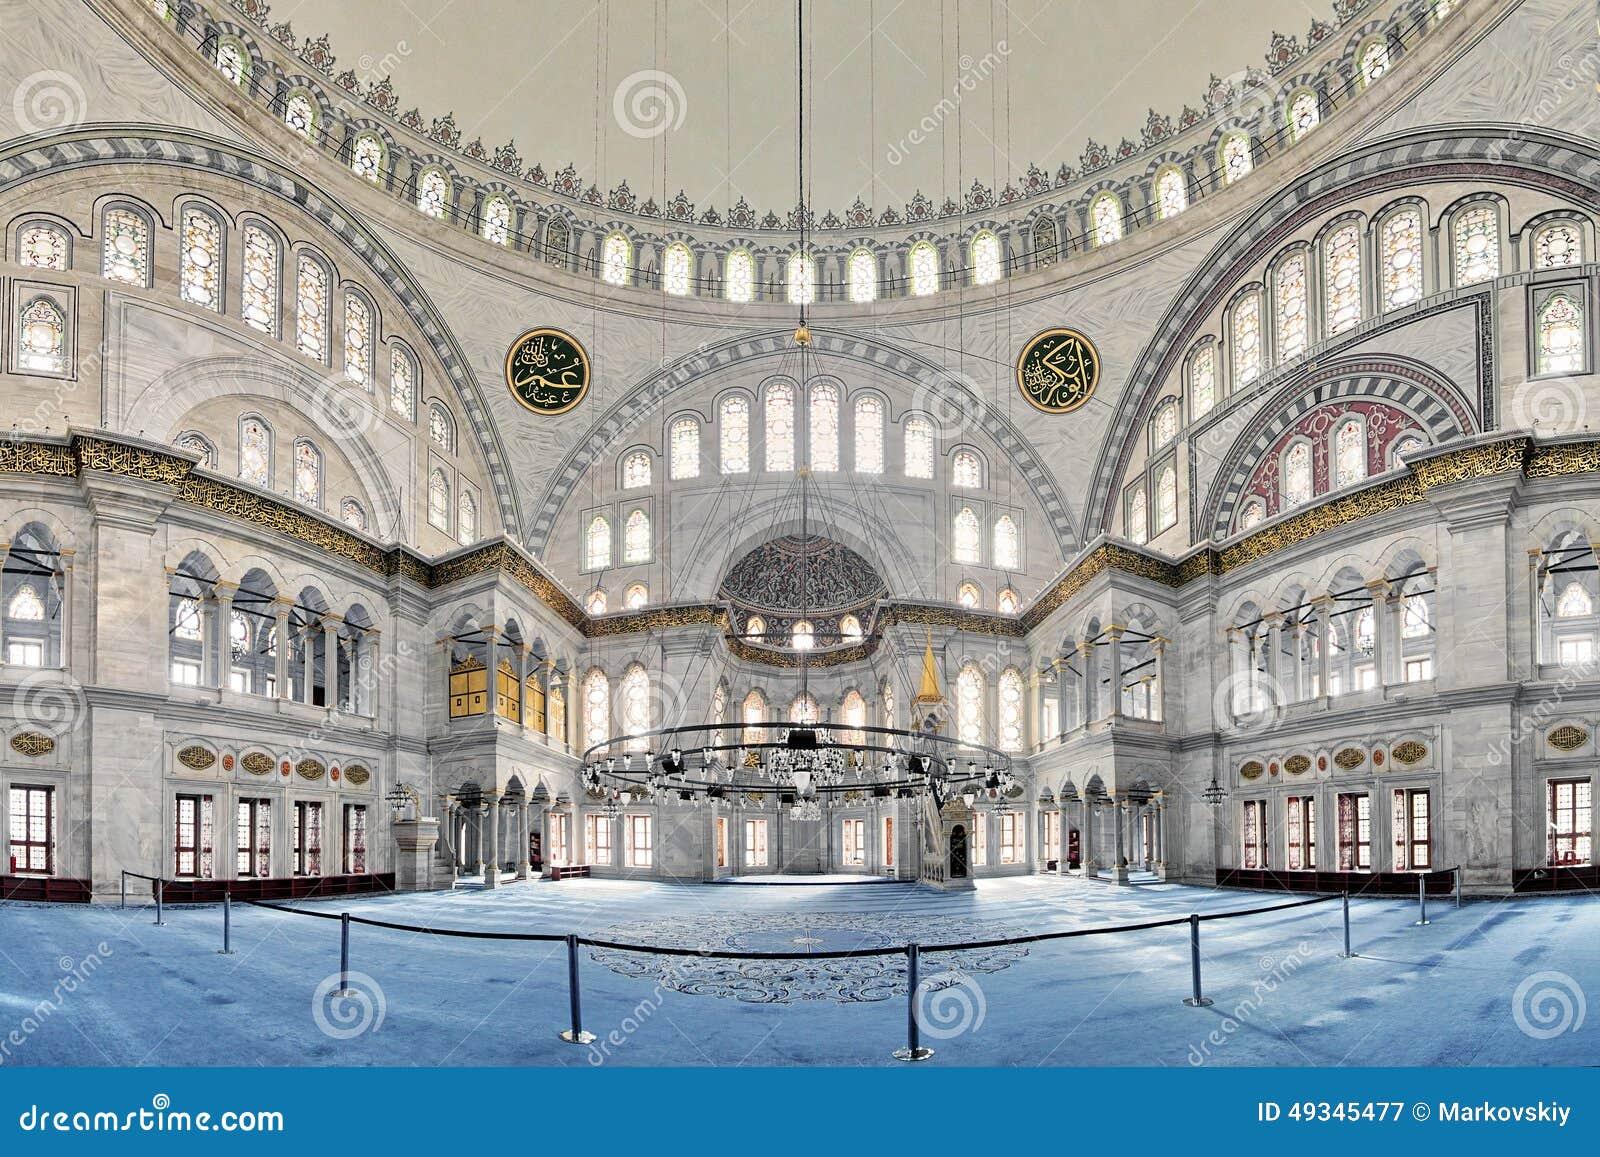 Interior Of Nuruosmaniye Mosque In Istanbul Stock Photo ...